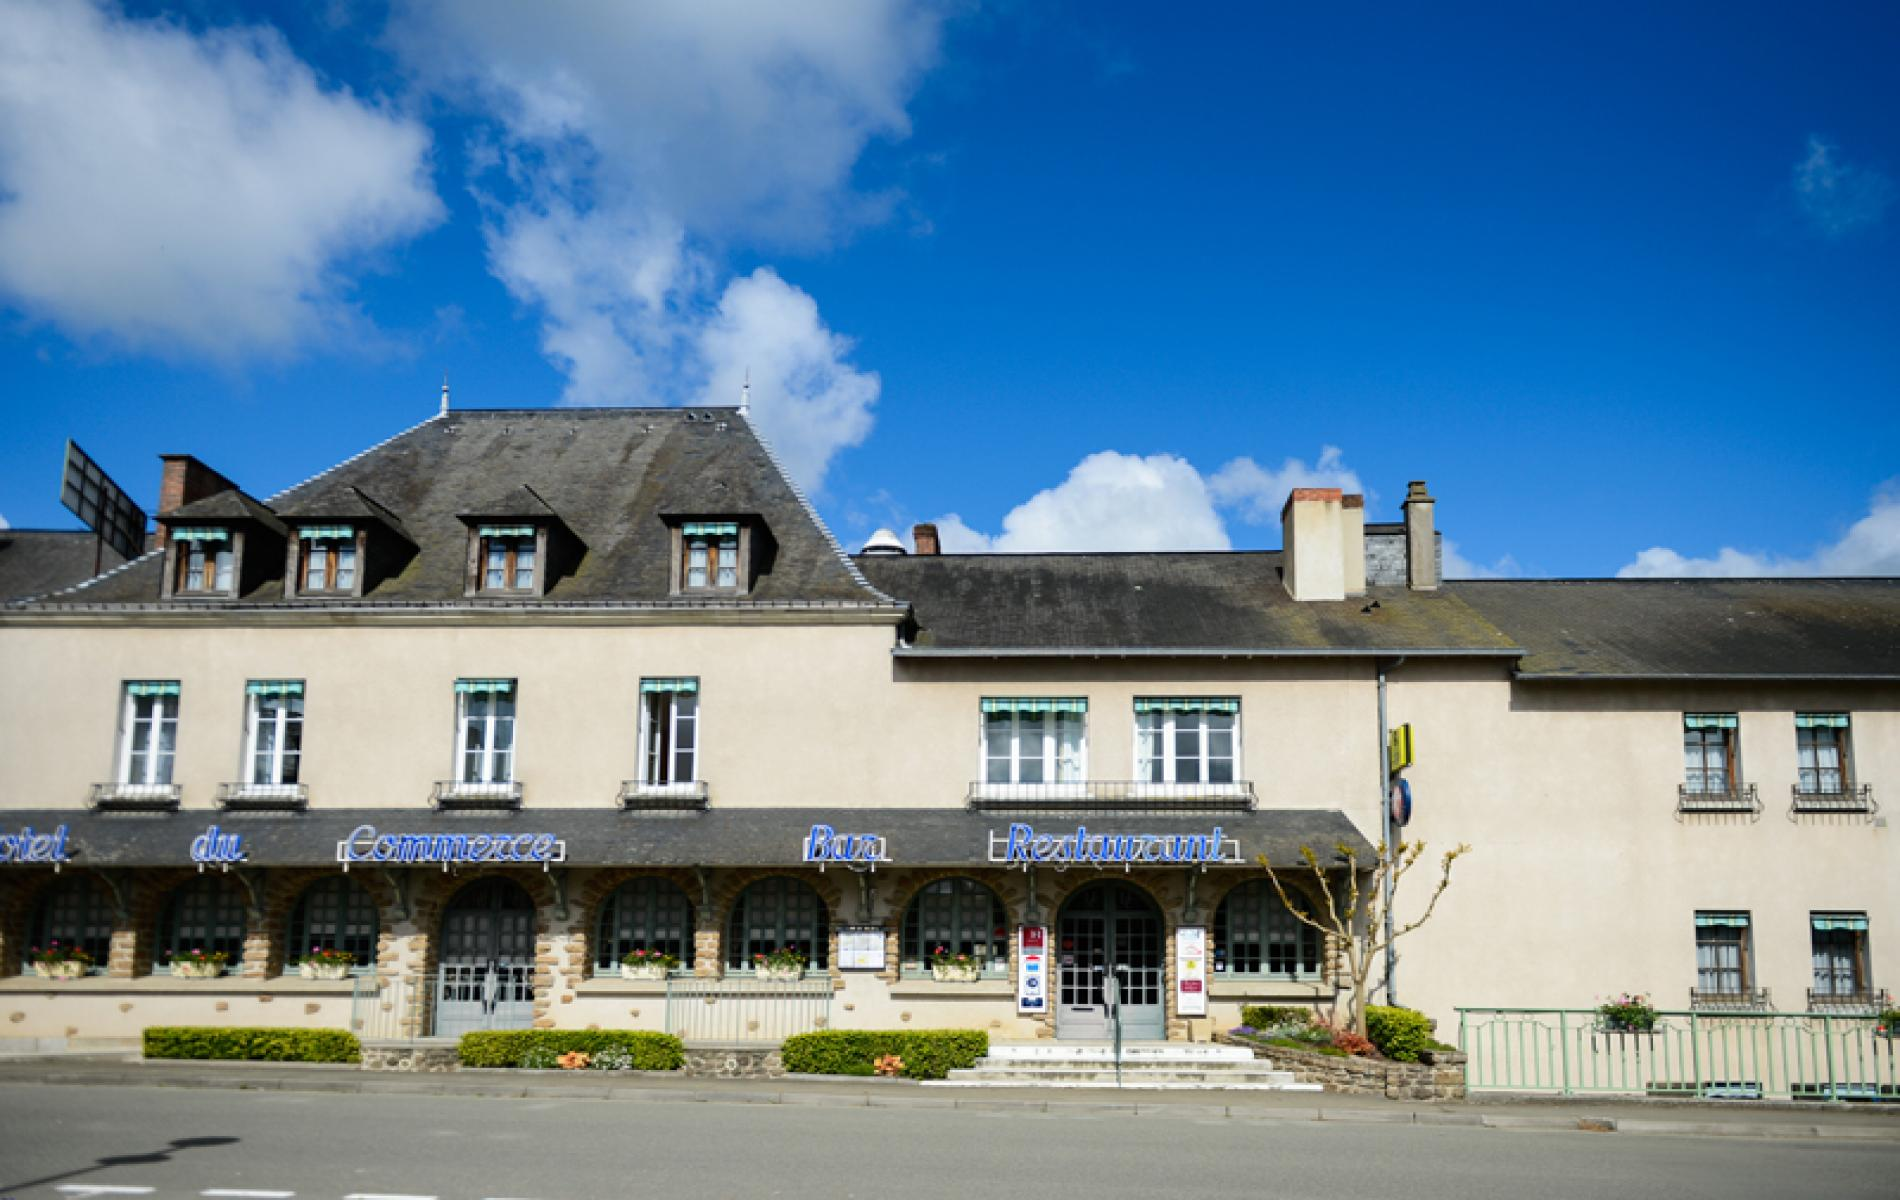 Hotel du Commerce - Hotel de charme en Normandie